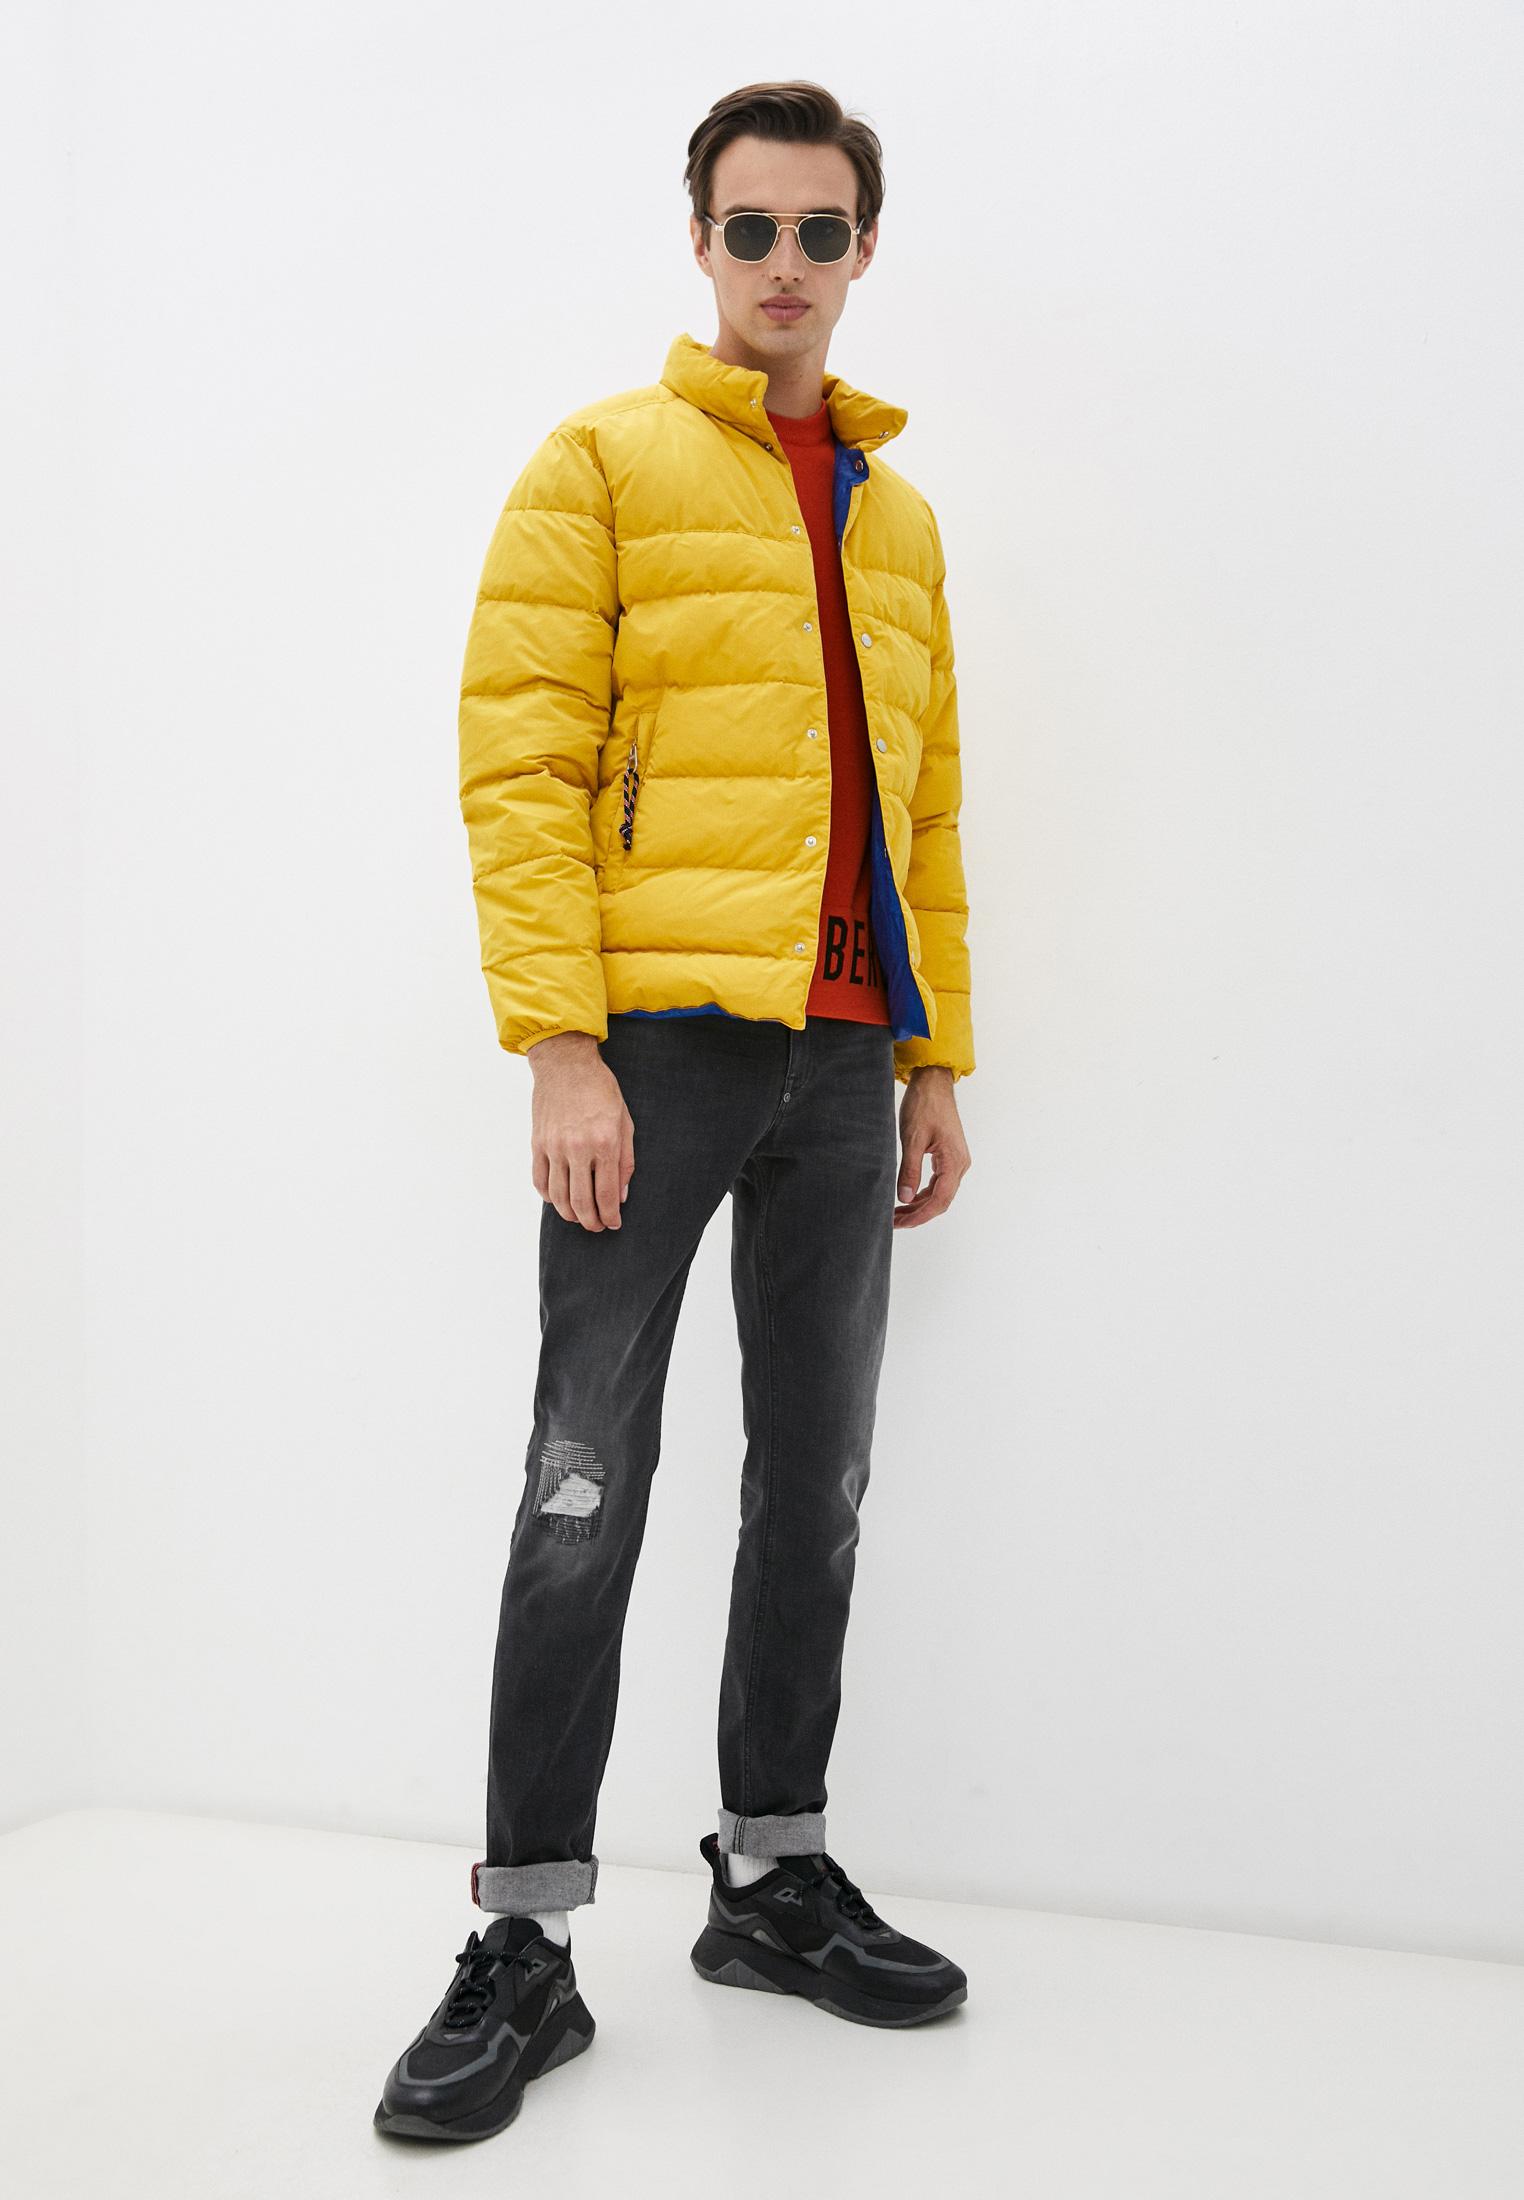 Мужская куртка Bikkembergs (Биккембергс) C H 087 00 T 9839: изображение 3